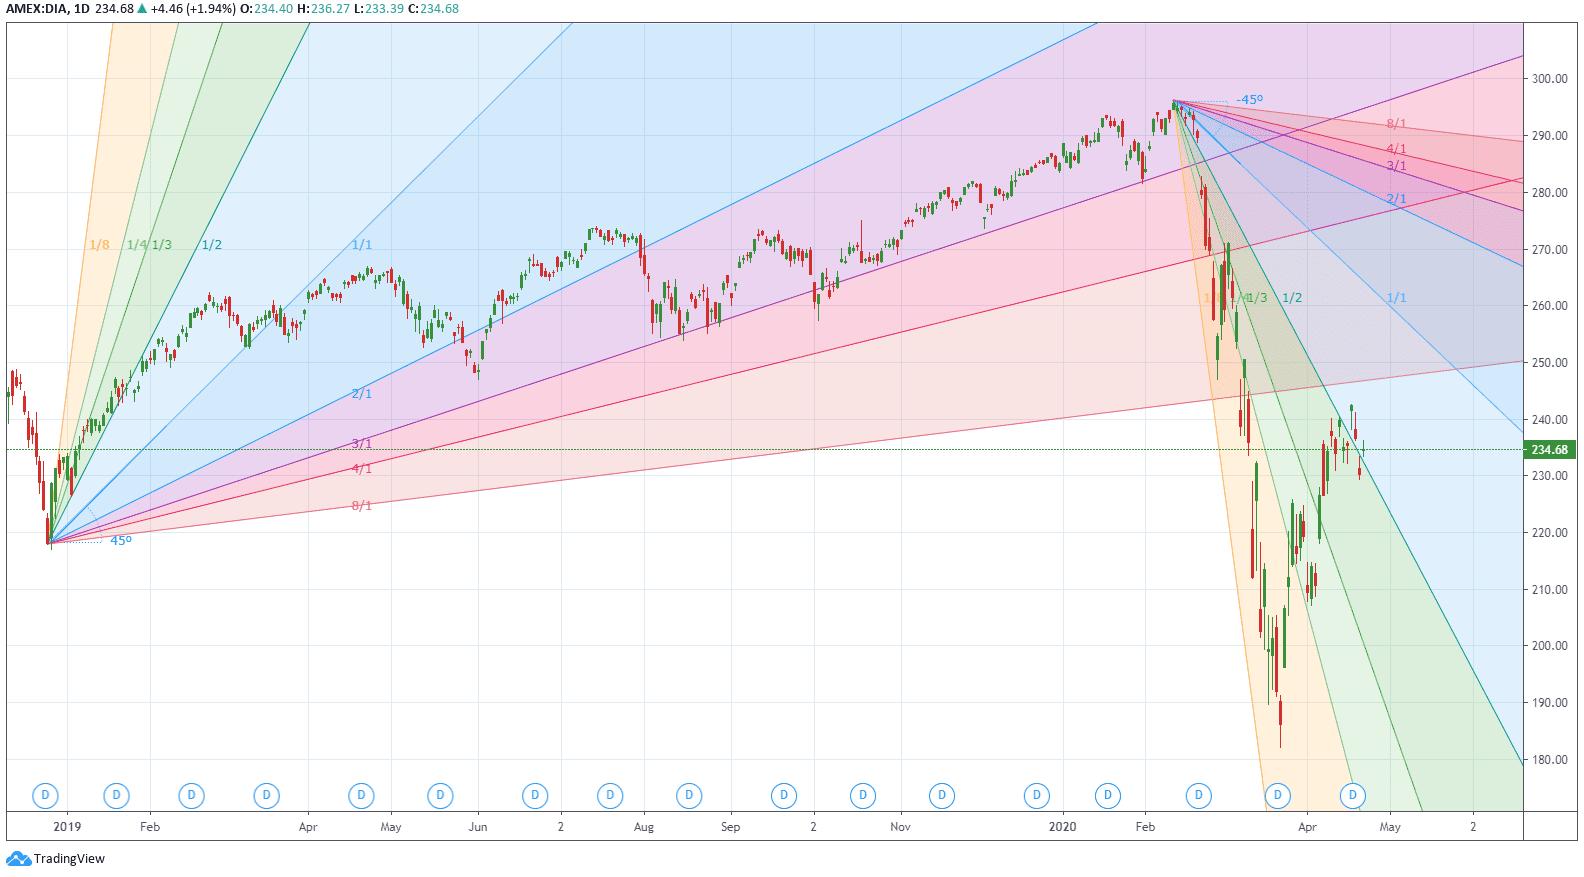 Gann angles drawn on a DIA daily chart